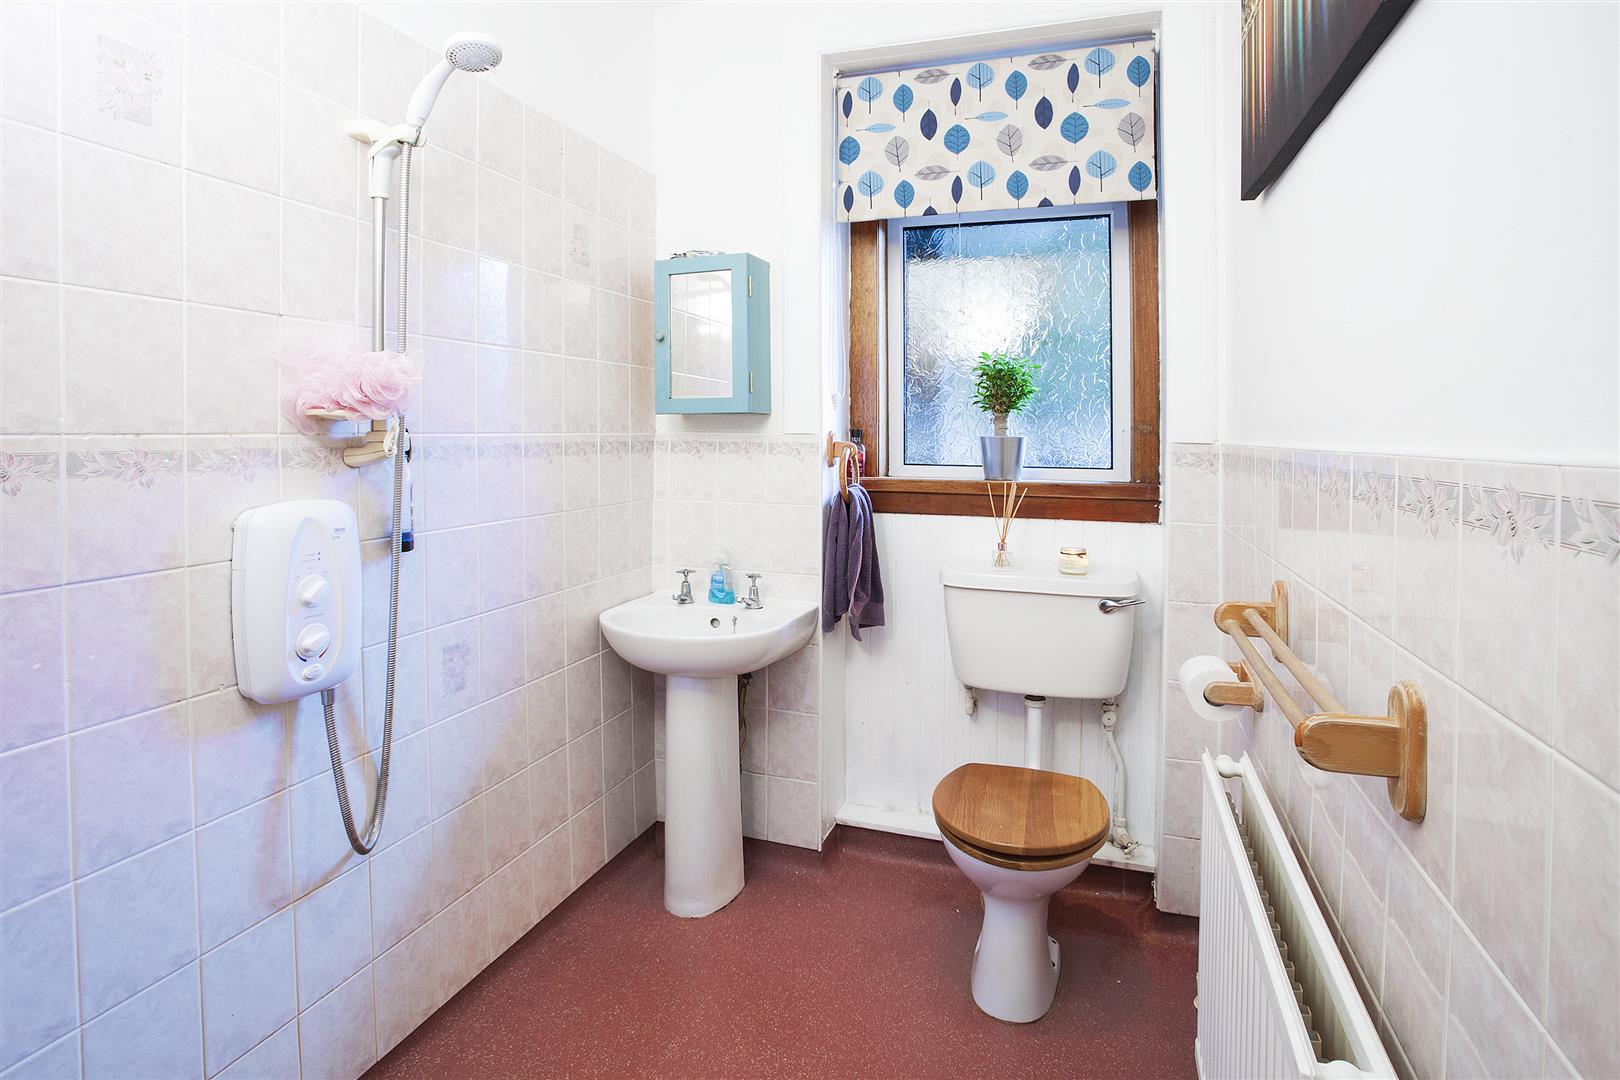 4, Albany Terrace, Newburgh, Fife, KY14 6BE, UK